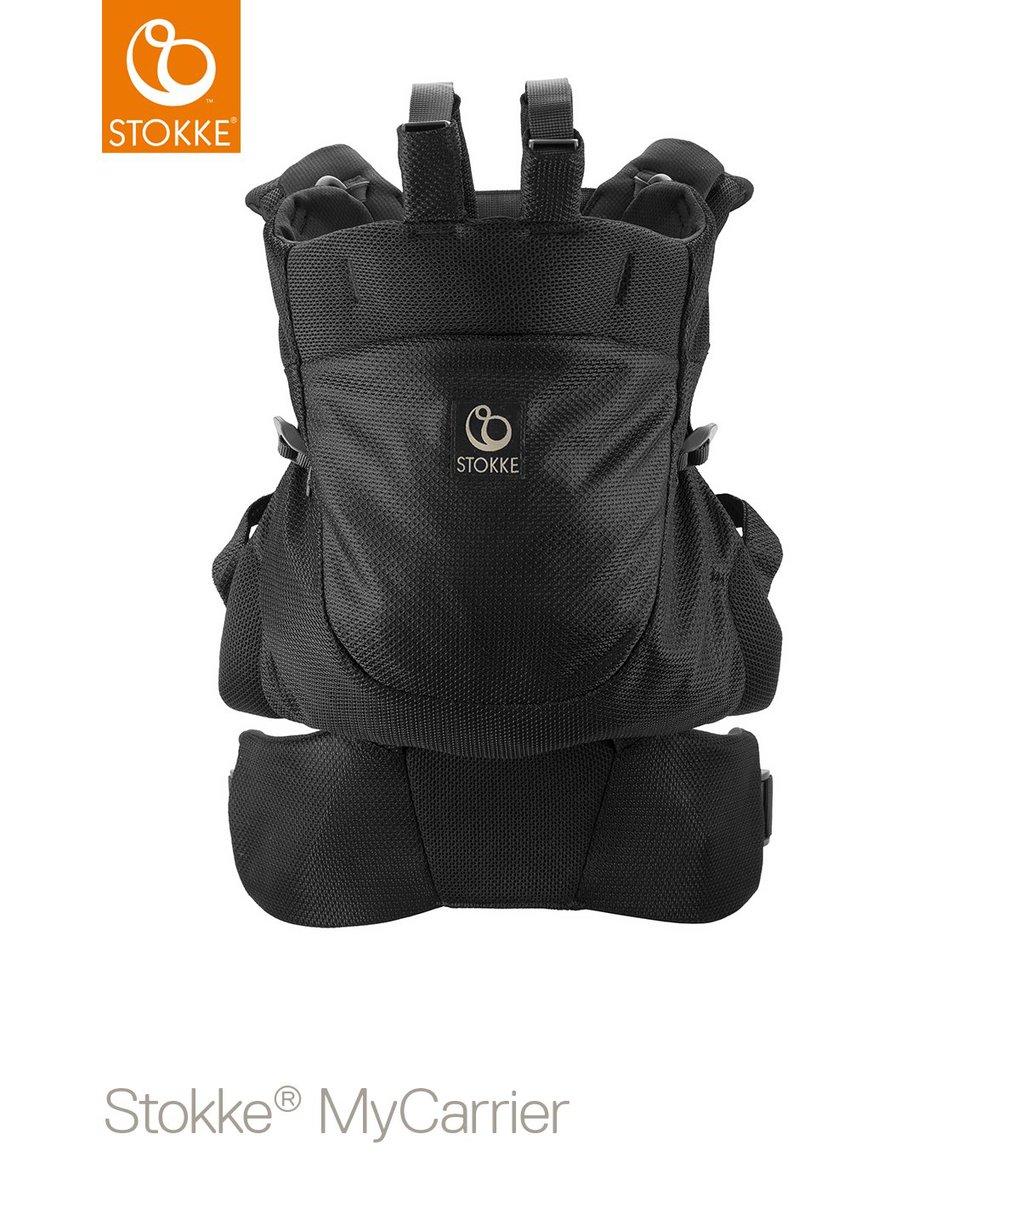 Stokke® mycarrier™ marsupio anteriore e posteriore - black mesh - Stokke